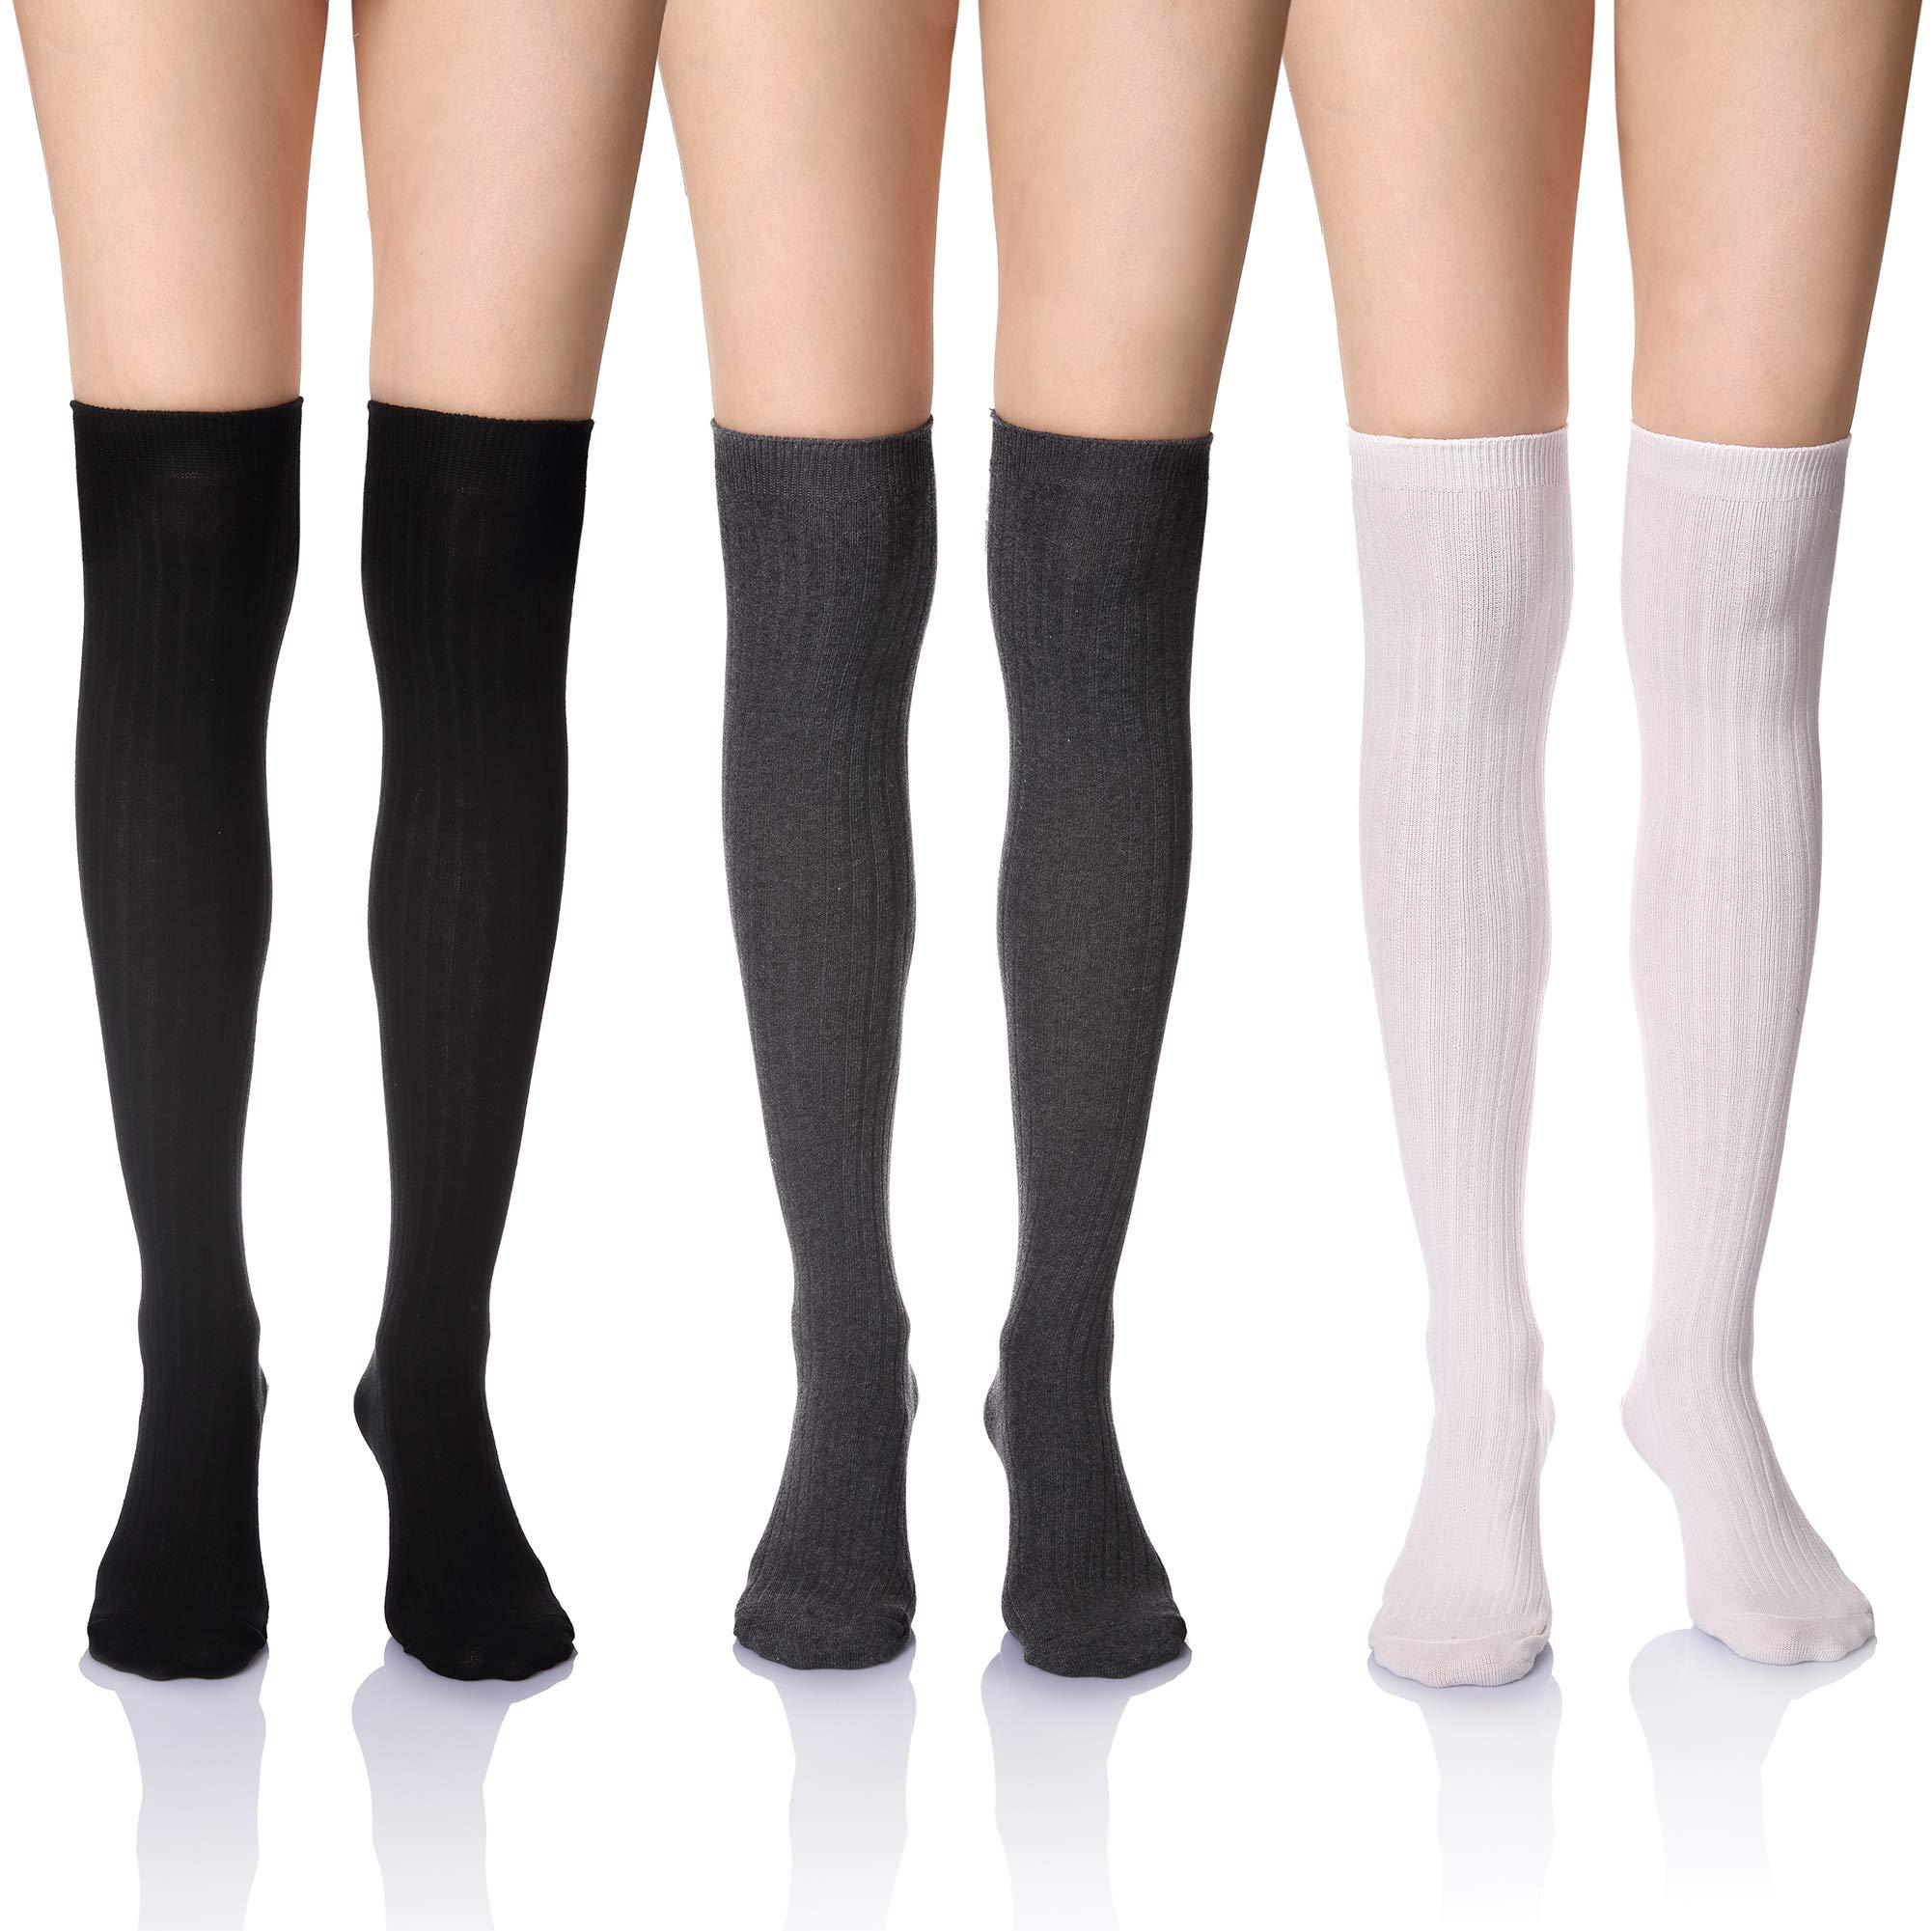 DoSmart Women's Girls Cotton Knee High Socks Winter Leg Warmth Socks (3 Pairs black/white/grey)